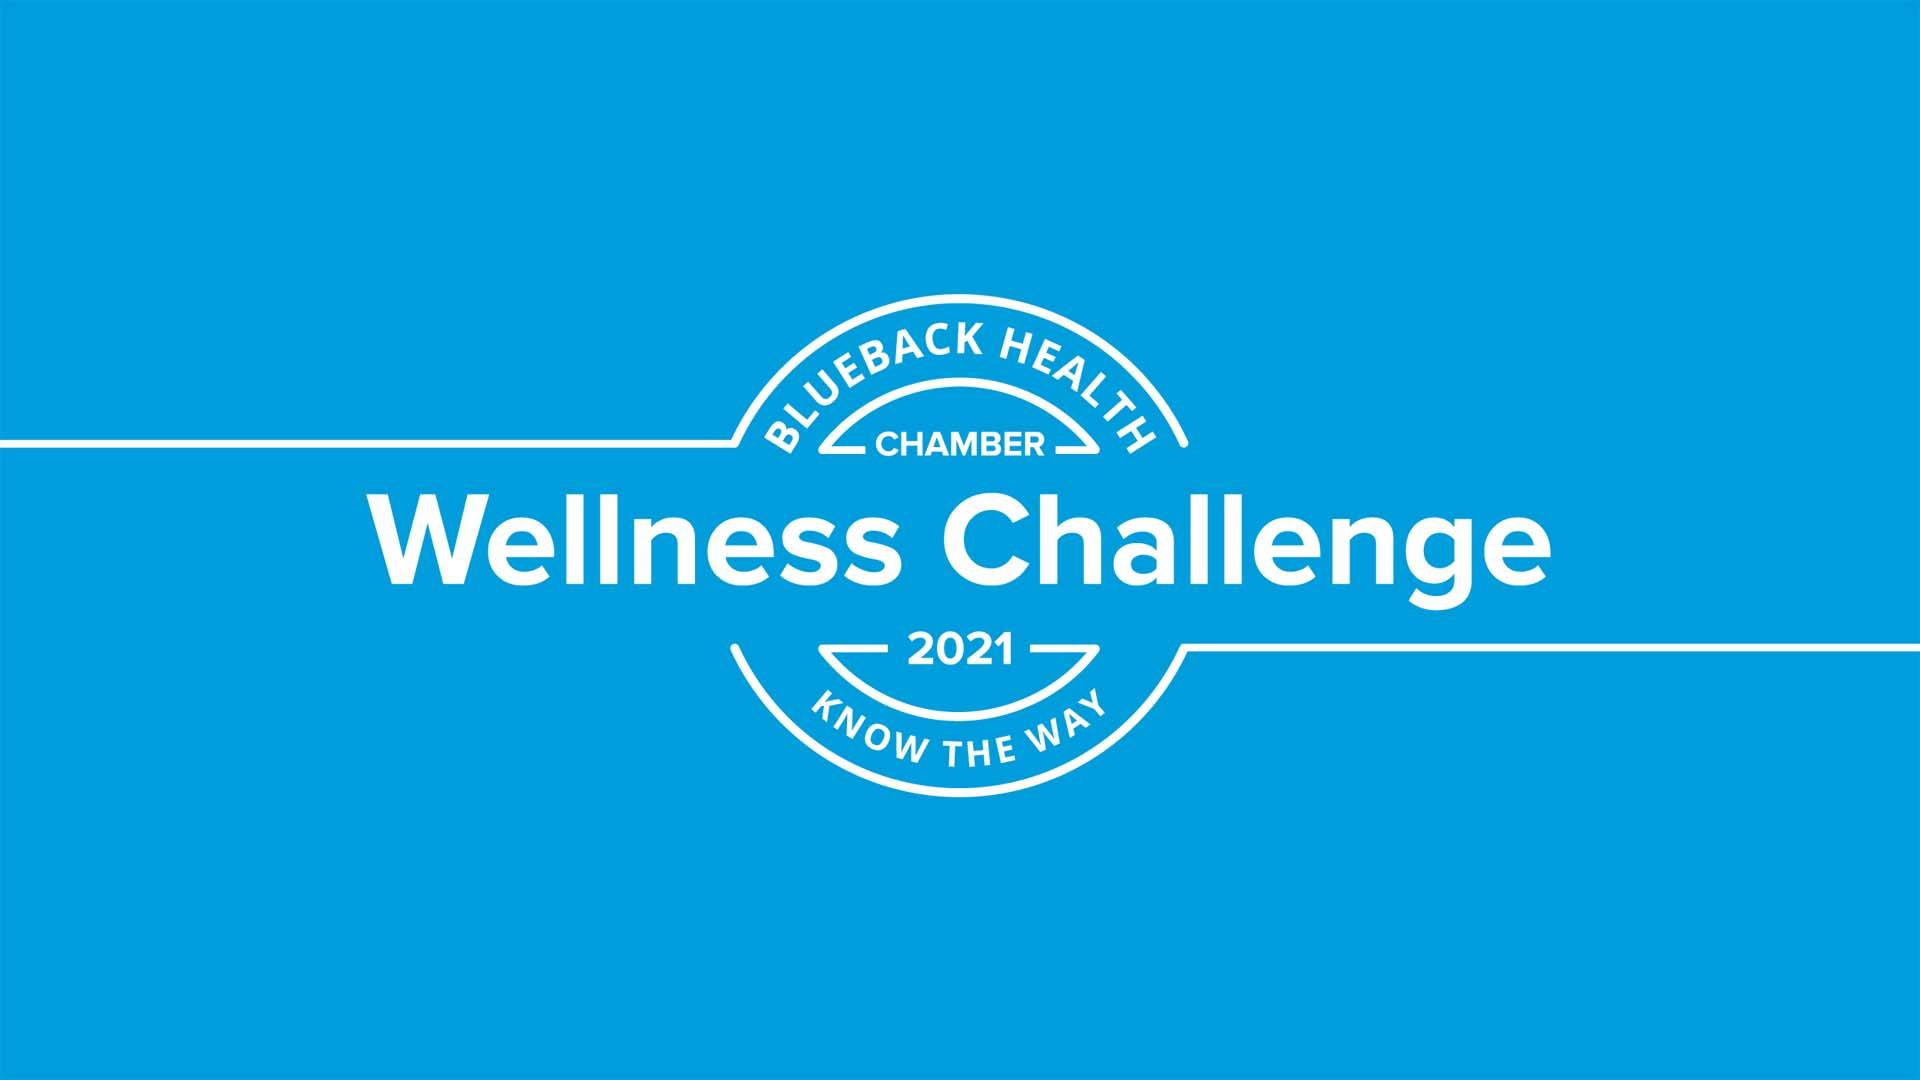 Chamber Wellness Challenge 2021